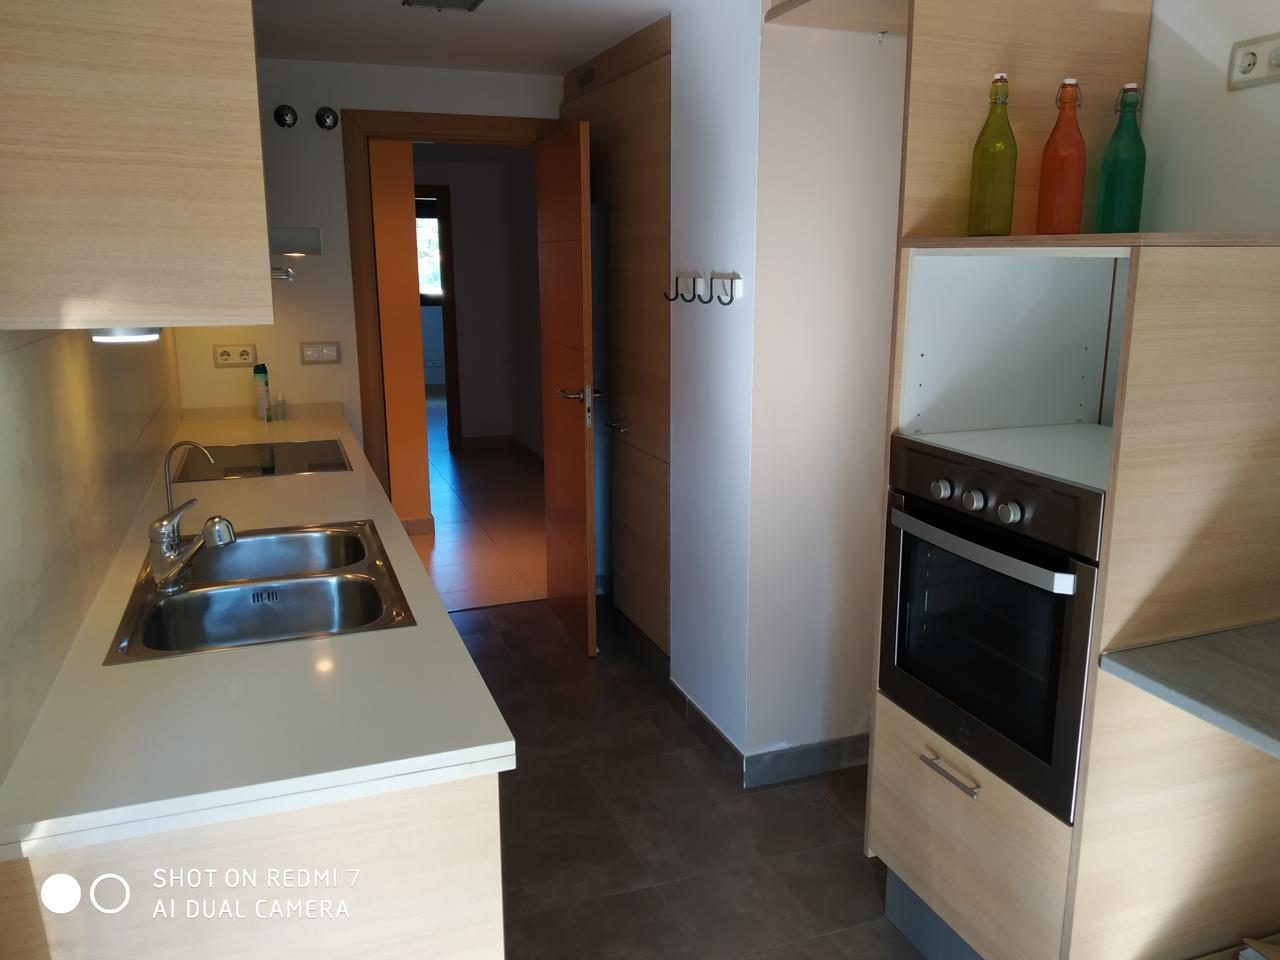 Alquiler Piso  Calle carrer de malta. Houscat.com te presenta este piso que se encuentra en carrer de